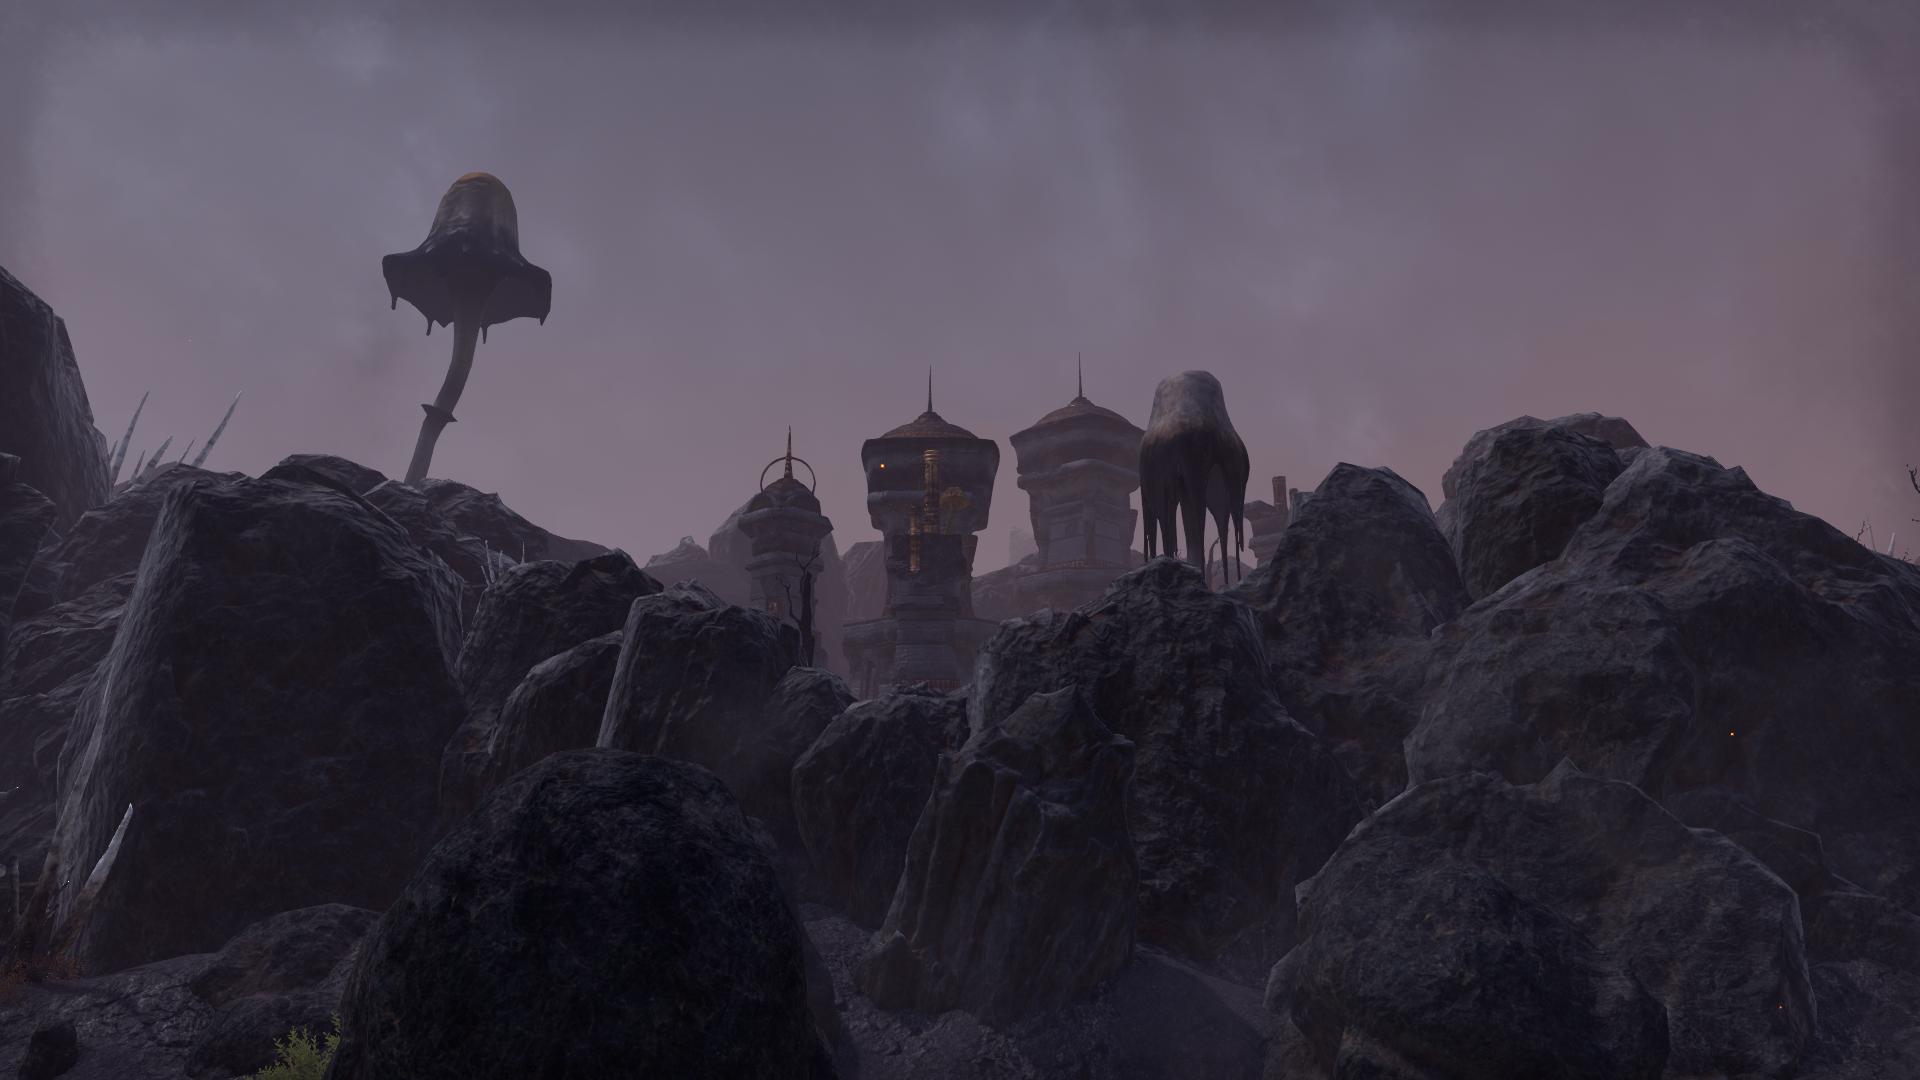 Друскашти (Online: Morrowind)